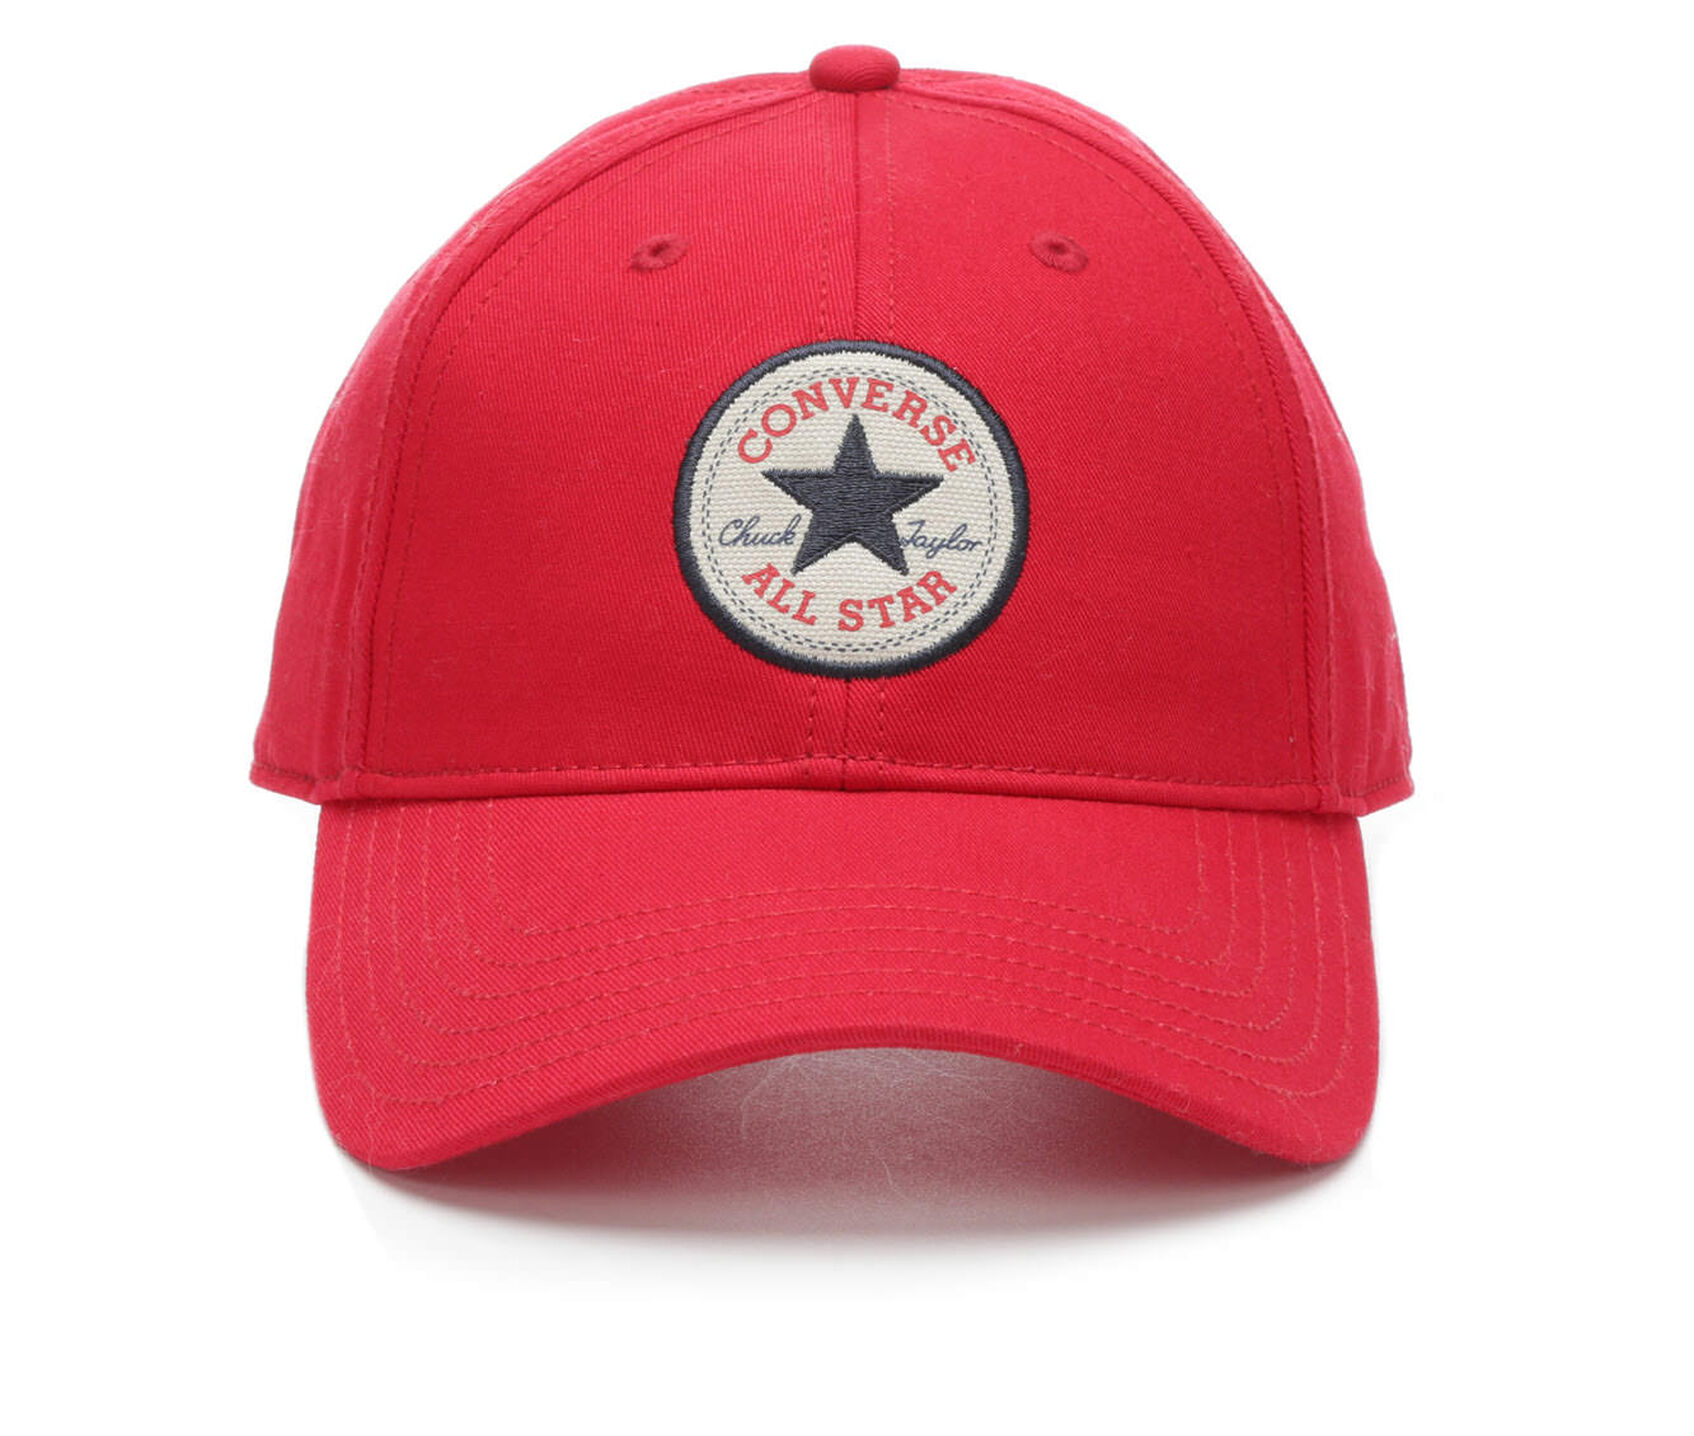 653455e10f9 Converse Core Classic Twill Baseball Cap. Carousel Controls